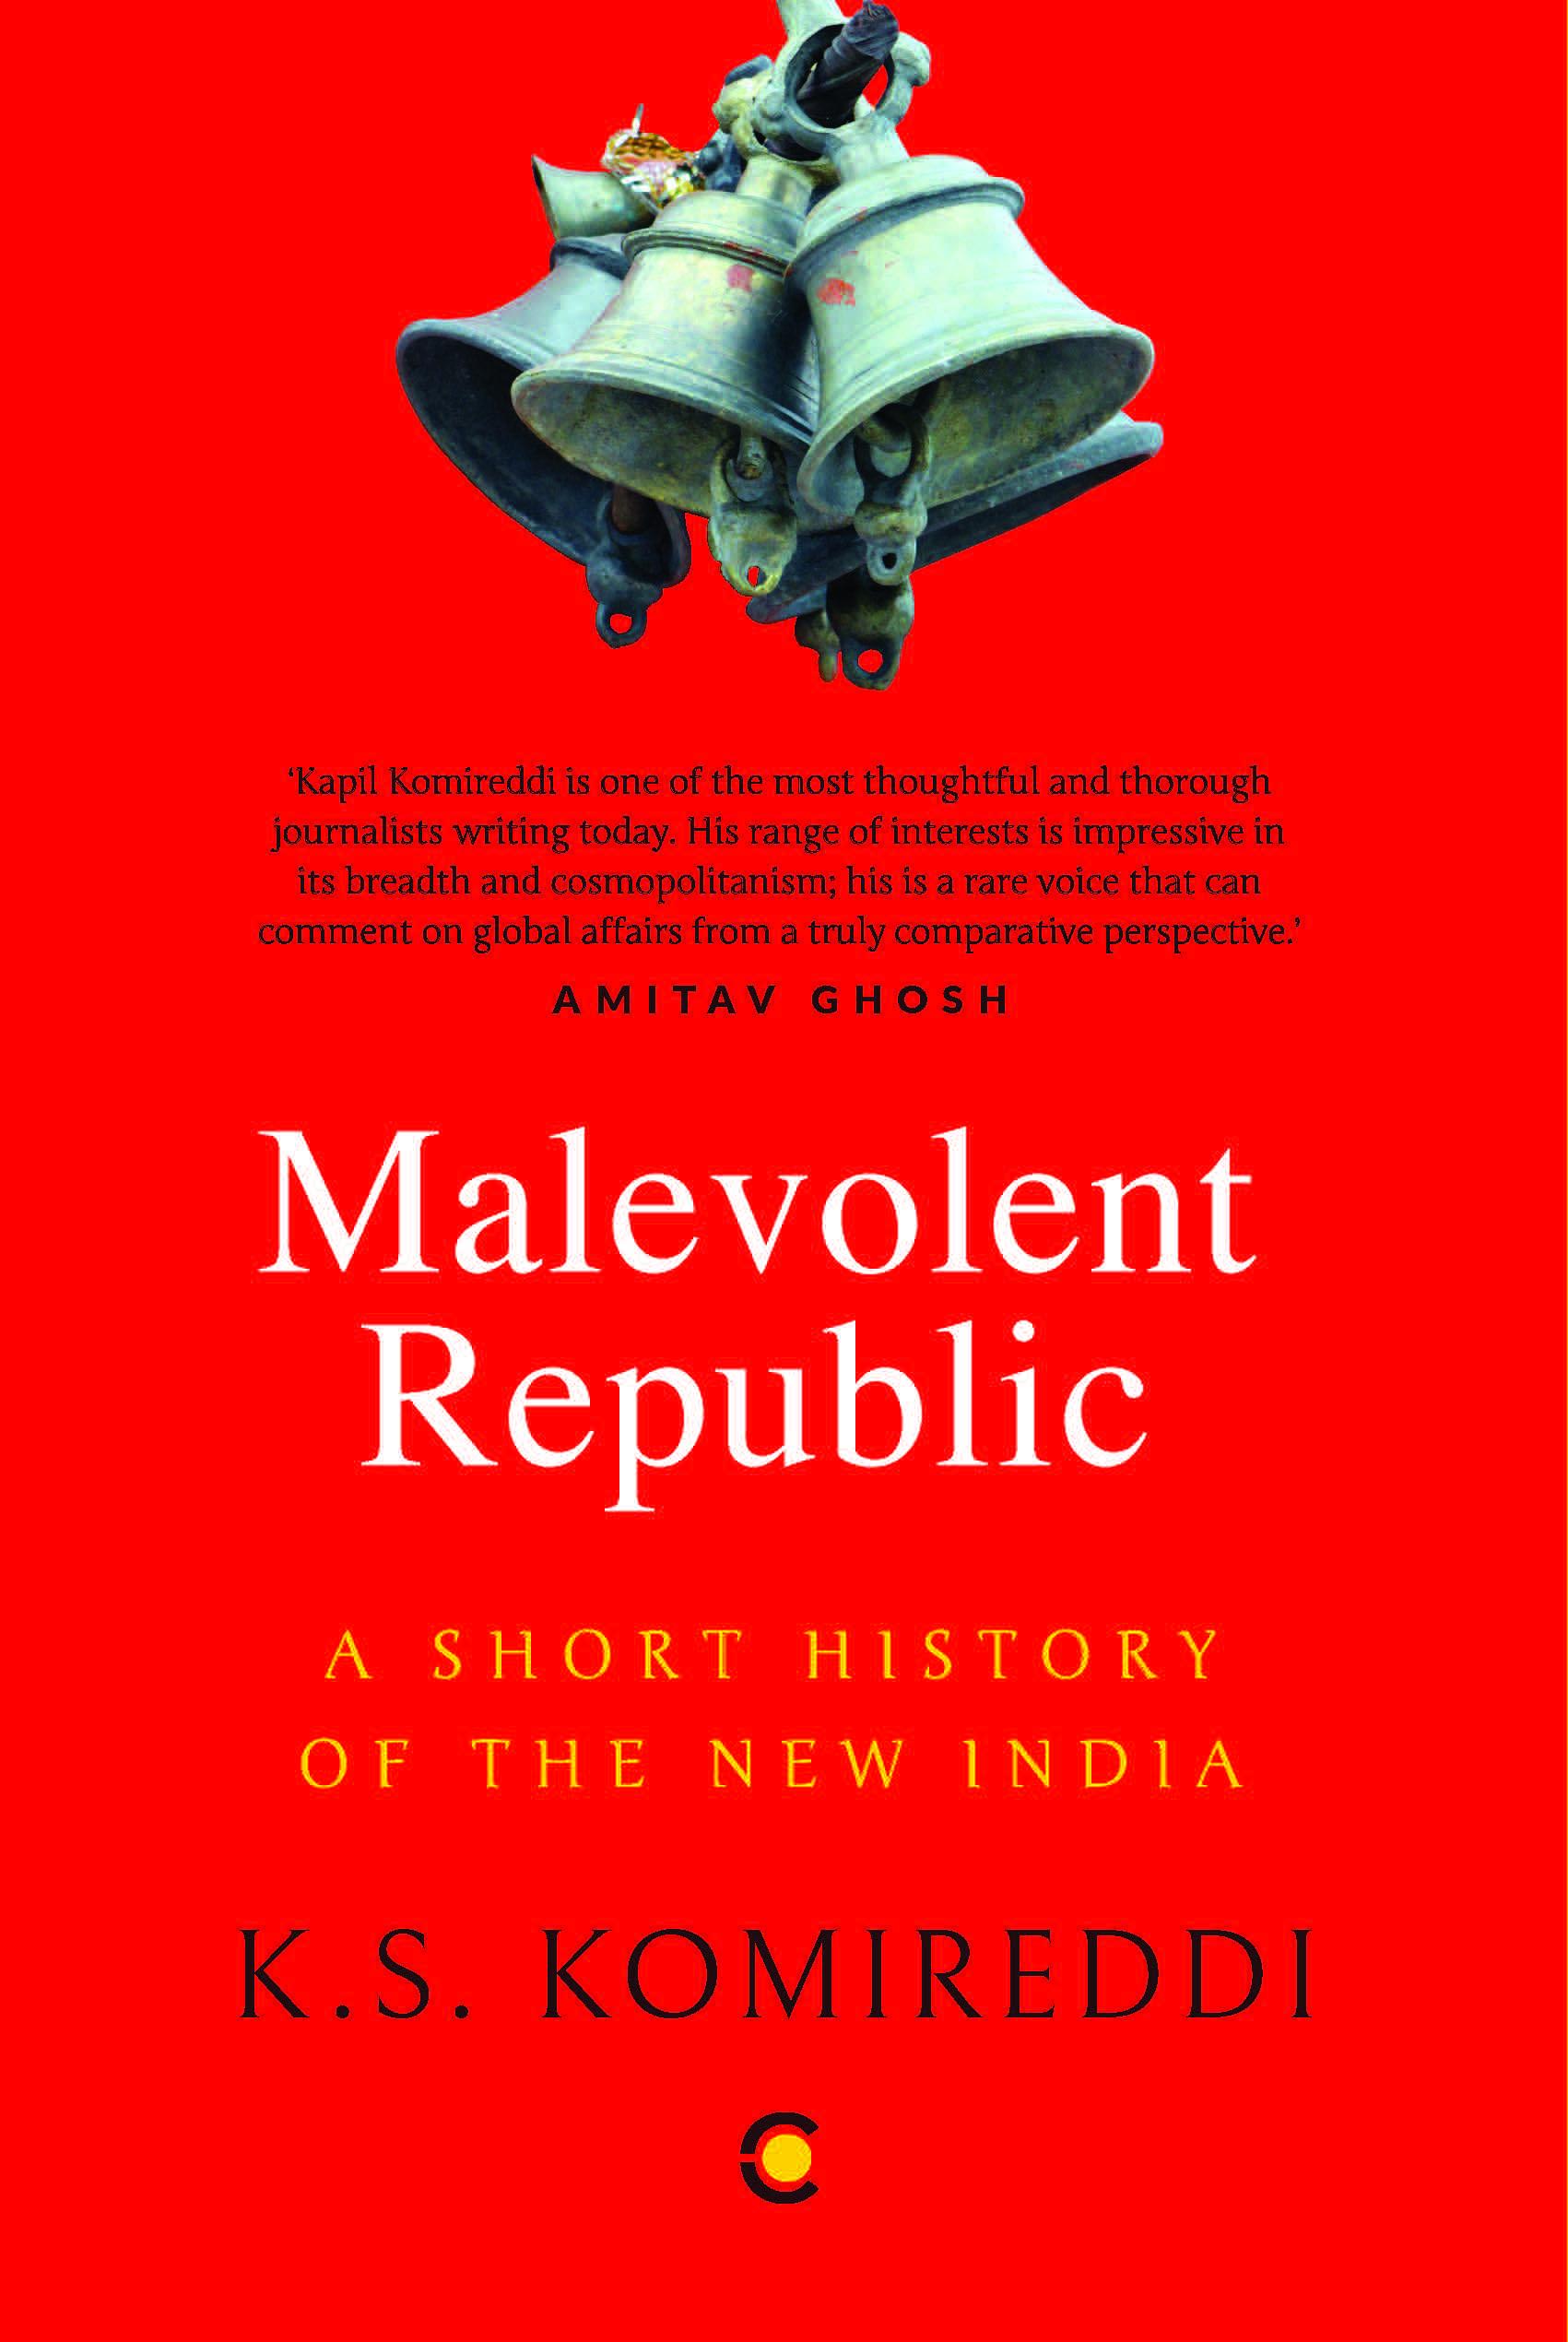 Malevolent Republic